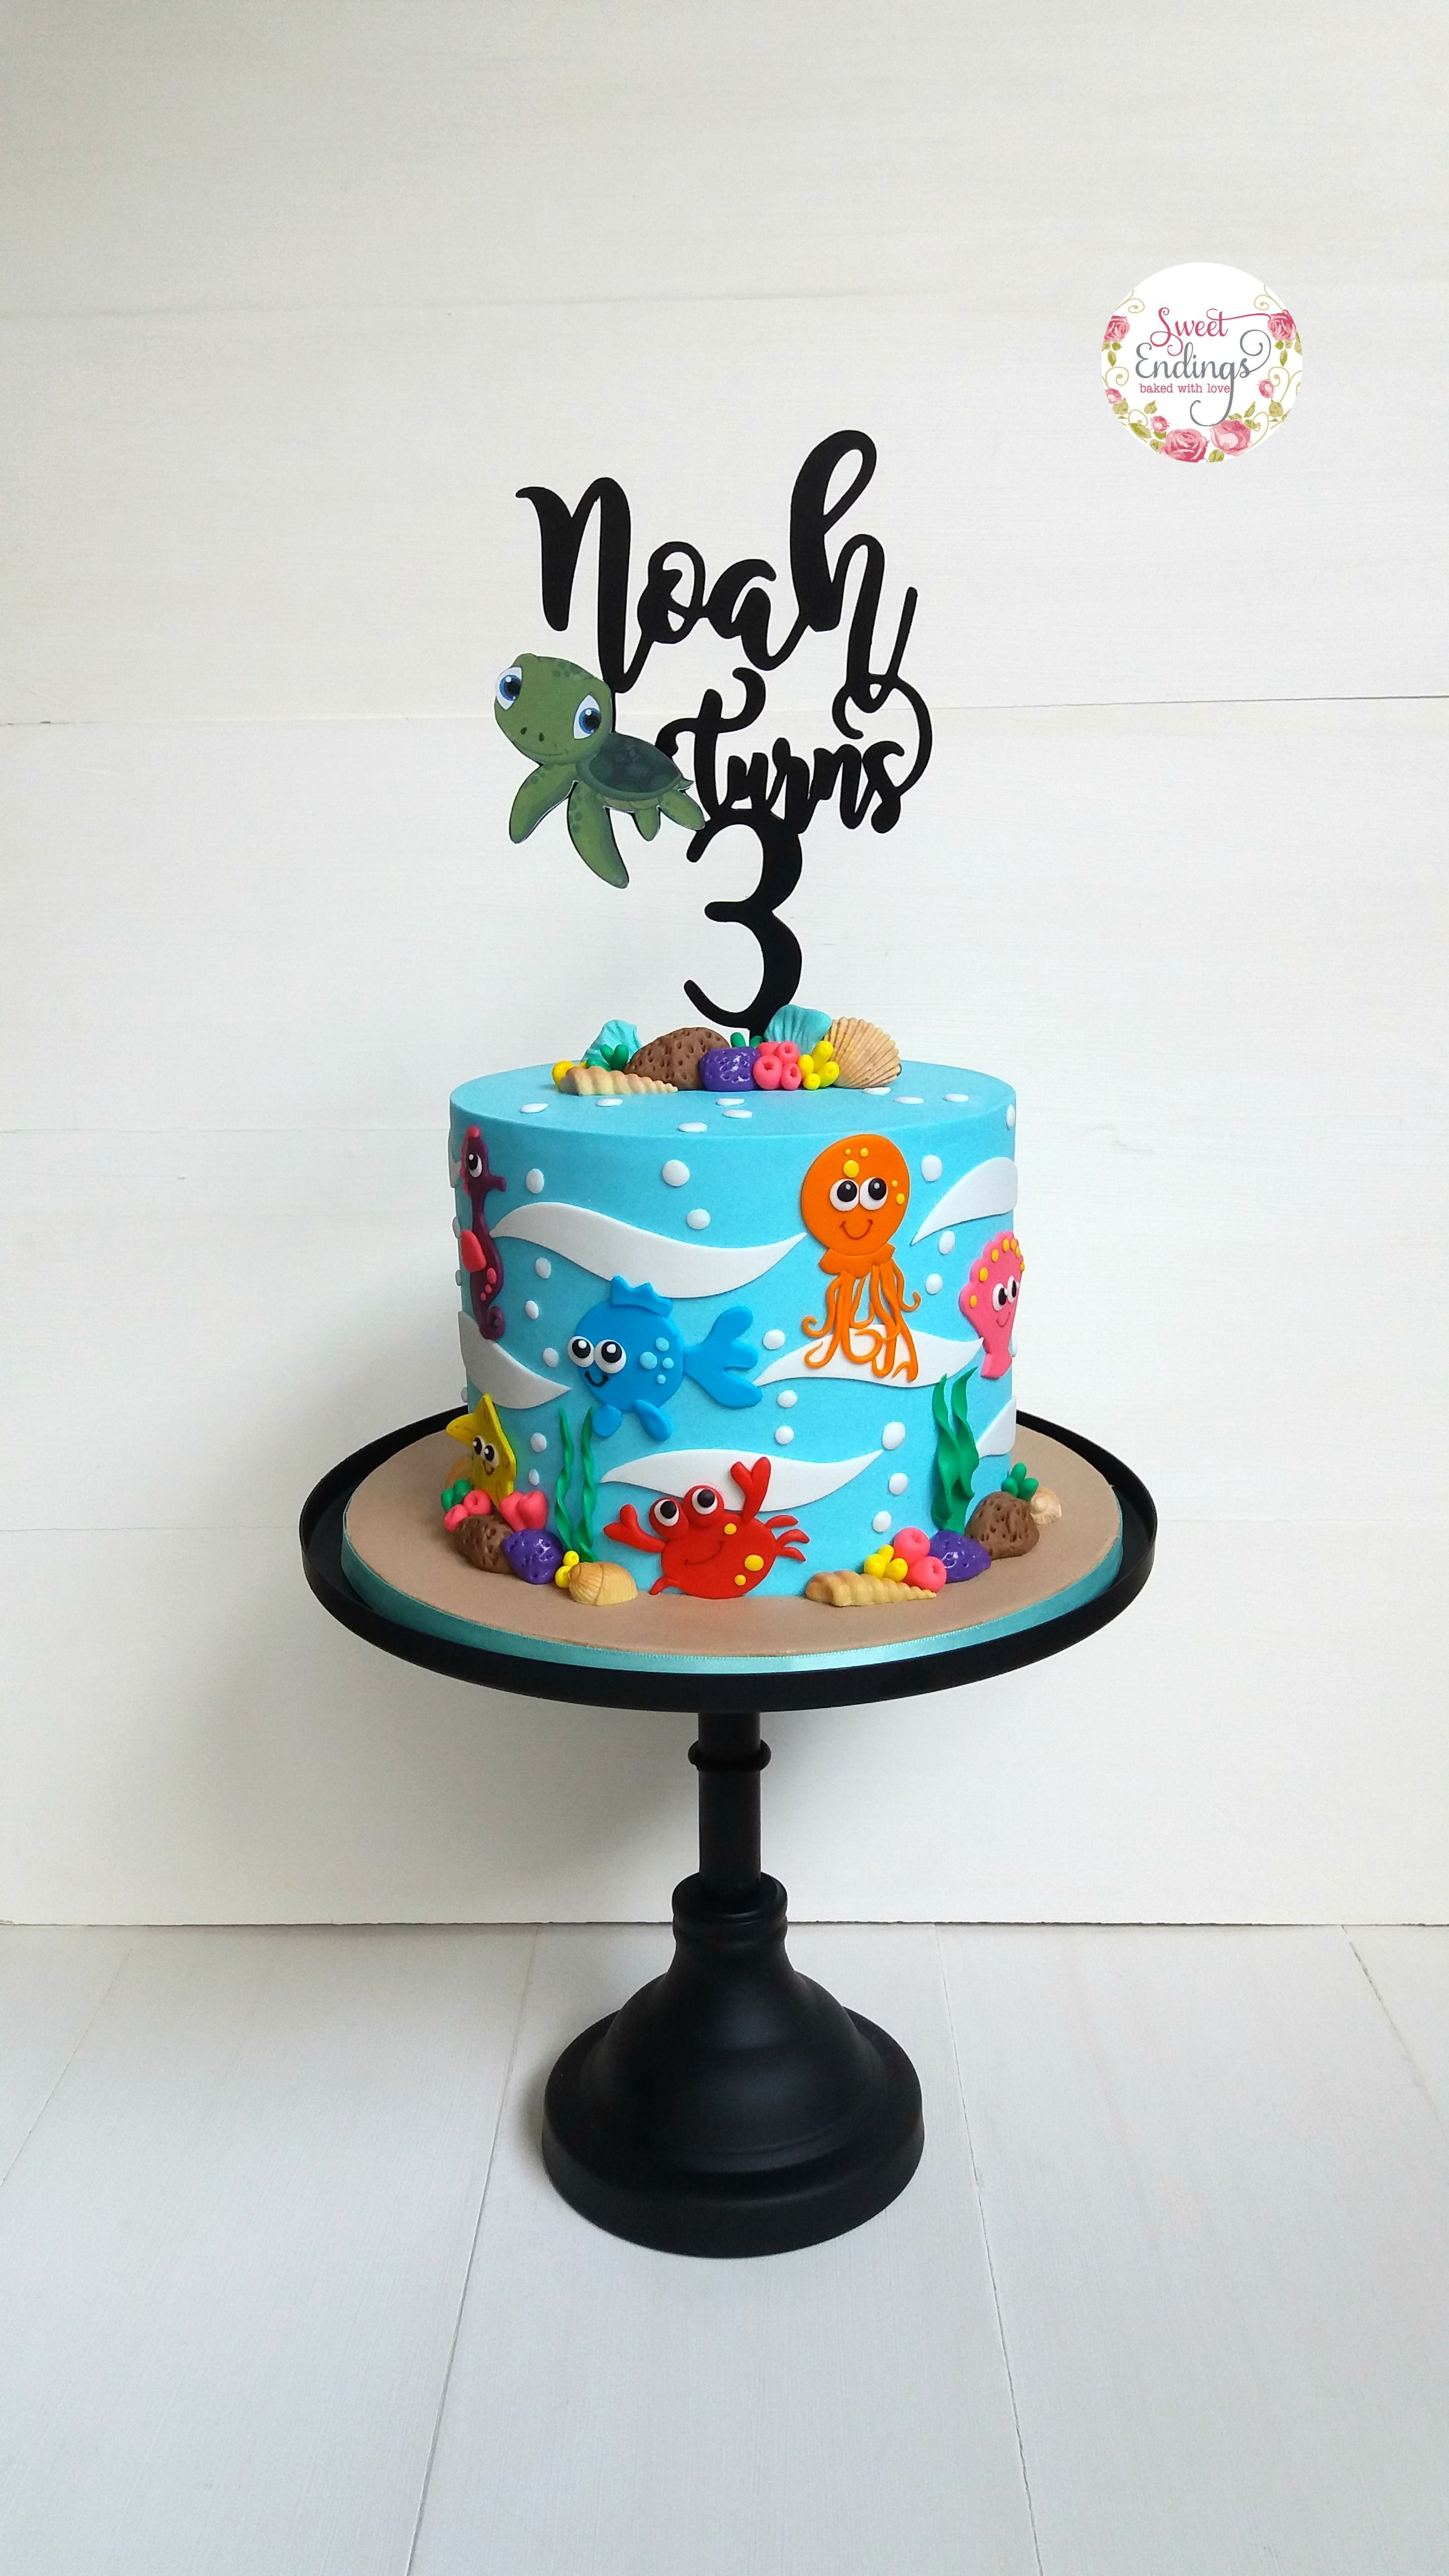 Pin On Novelty Cakes Sweet Endings By Lulu